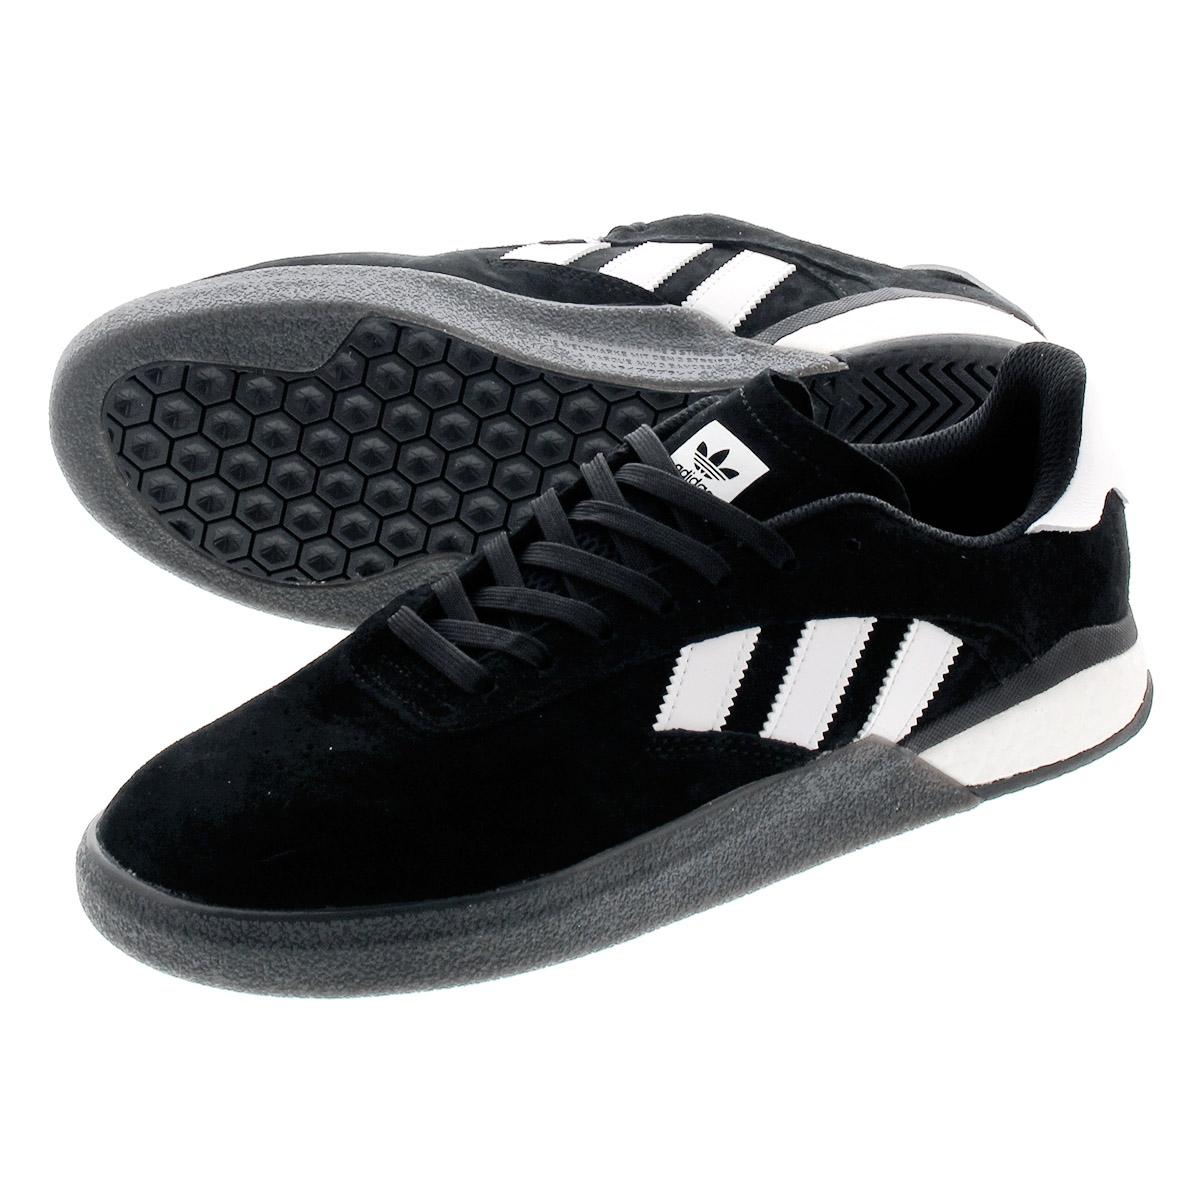 adidas 3ST. 004 Adidas 3ST. 004 CORE BLACKFTWR WHITECORE BLACK ee6160